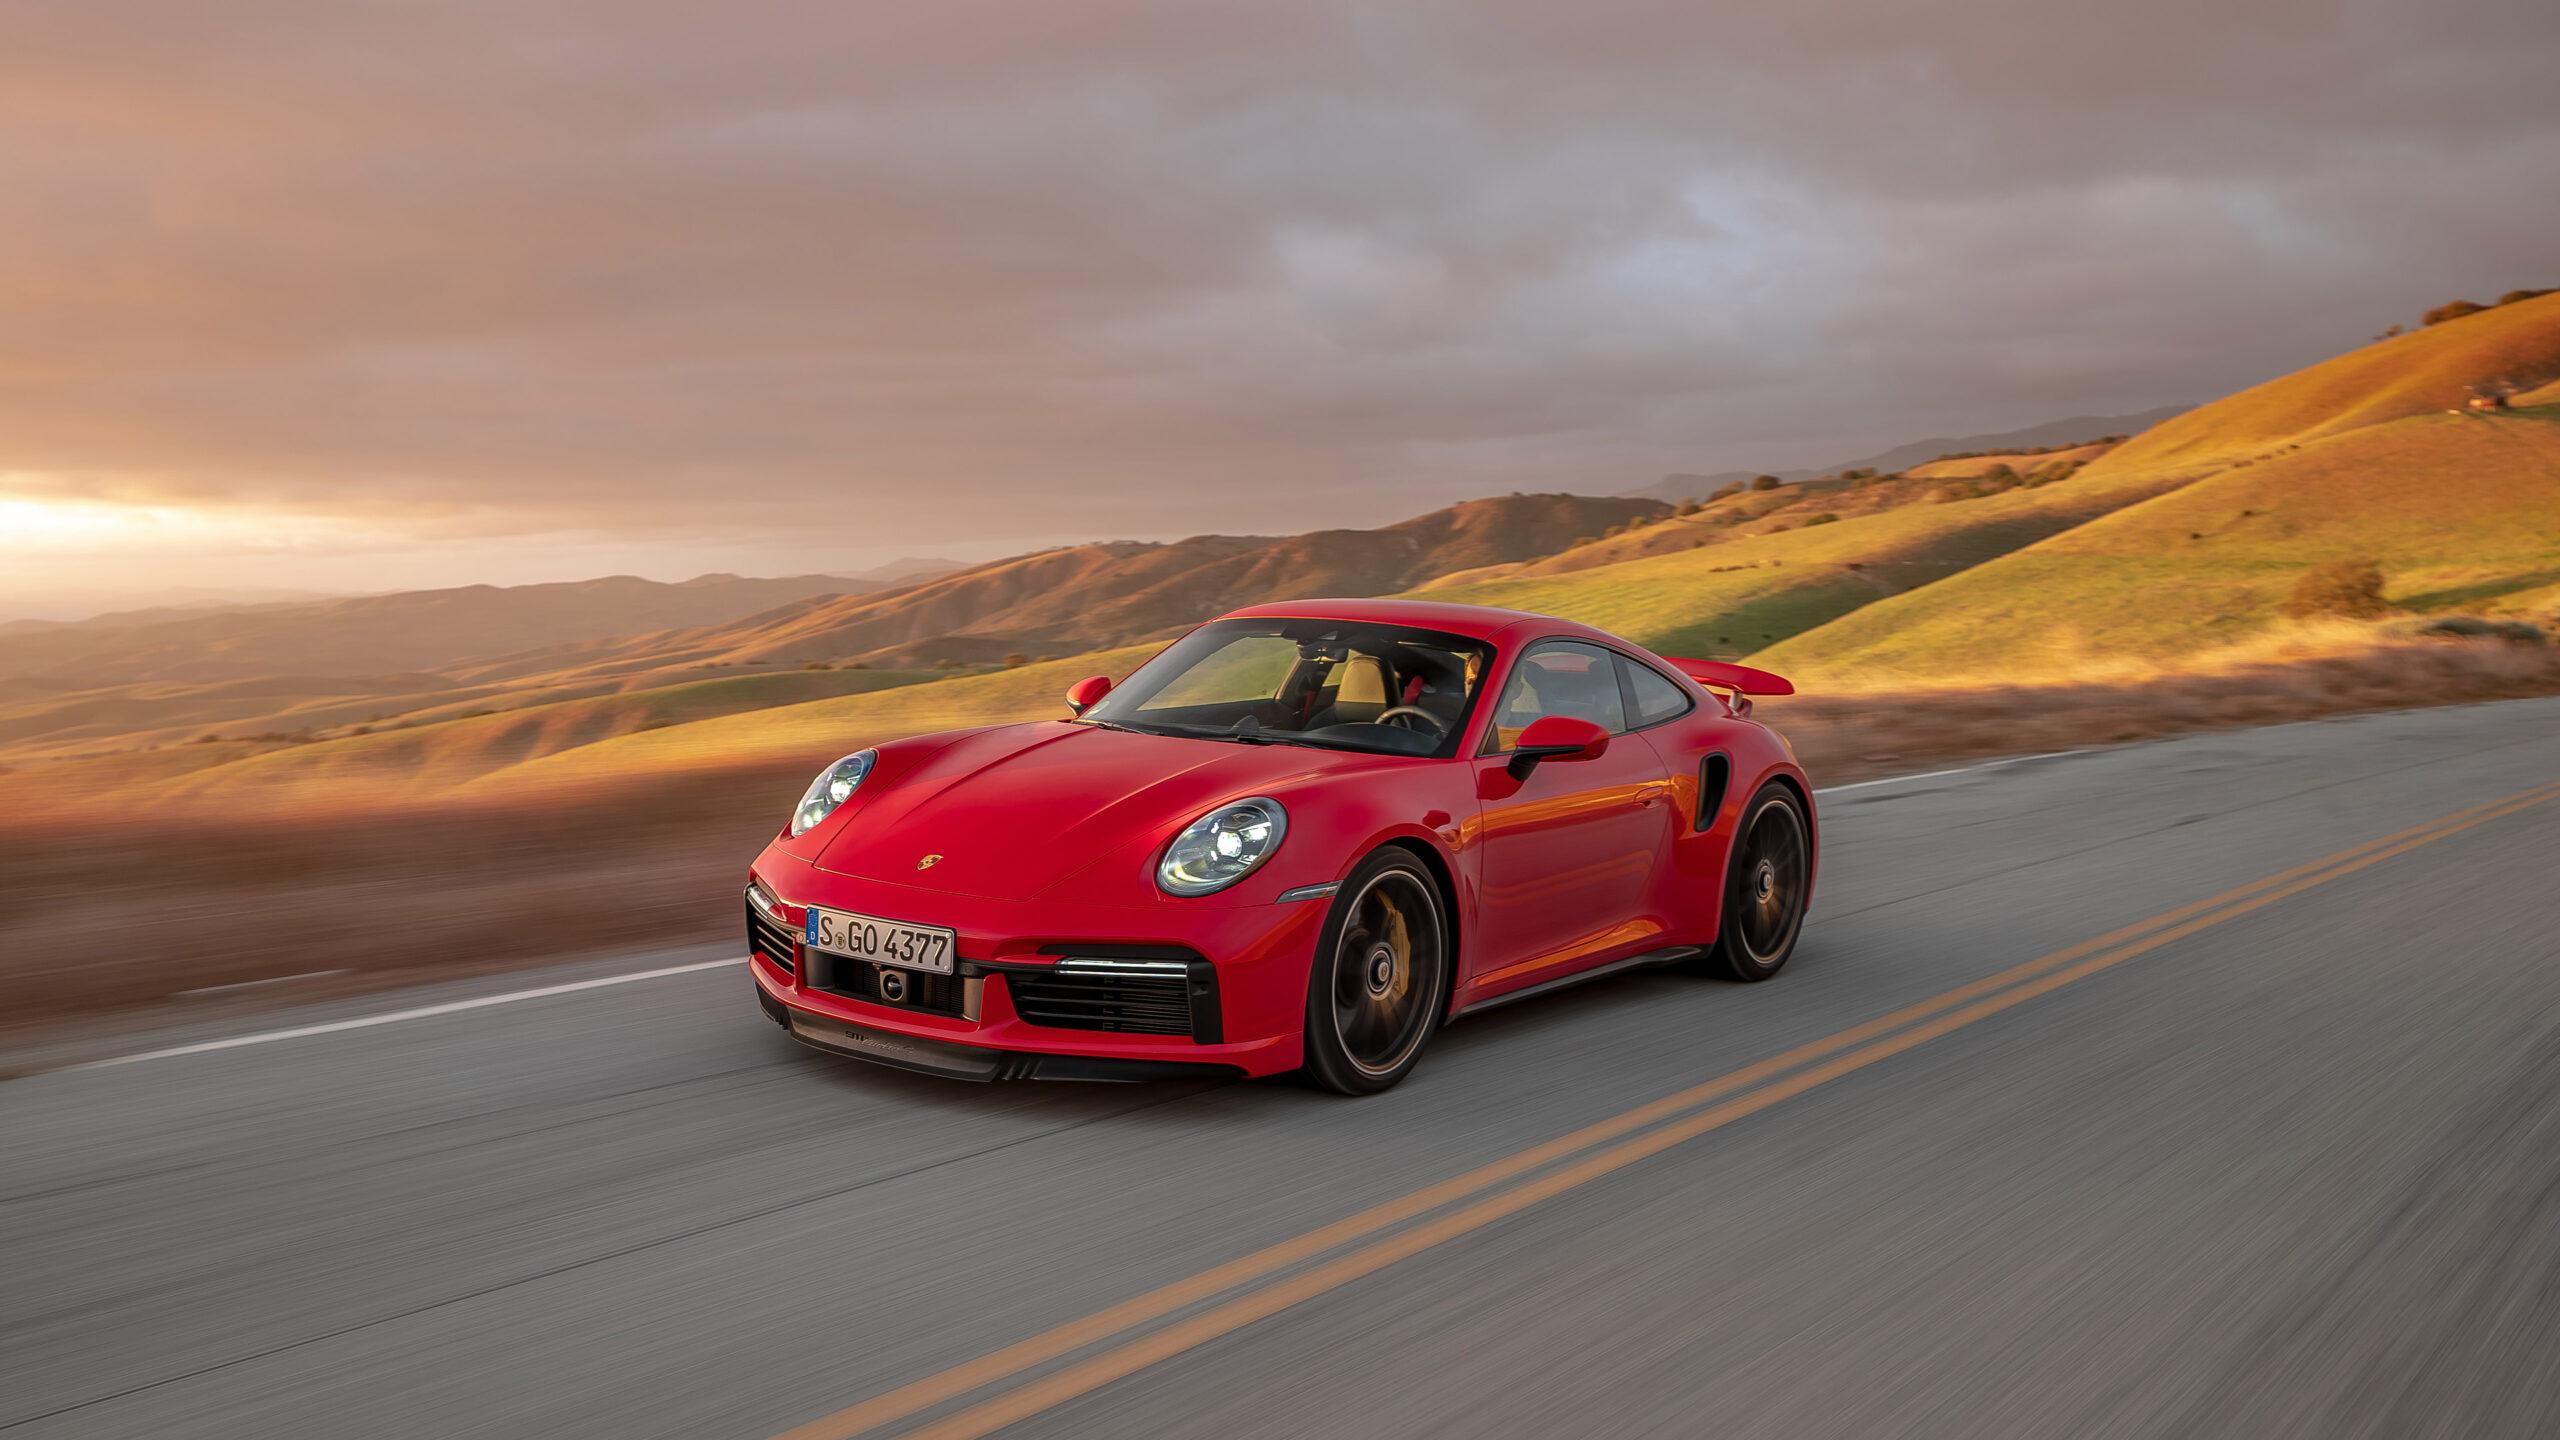 2020 Porsche 911 Turbo Wallpapers SuperCarsnet 2560x1440